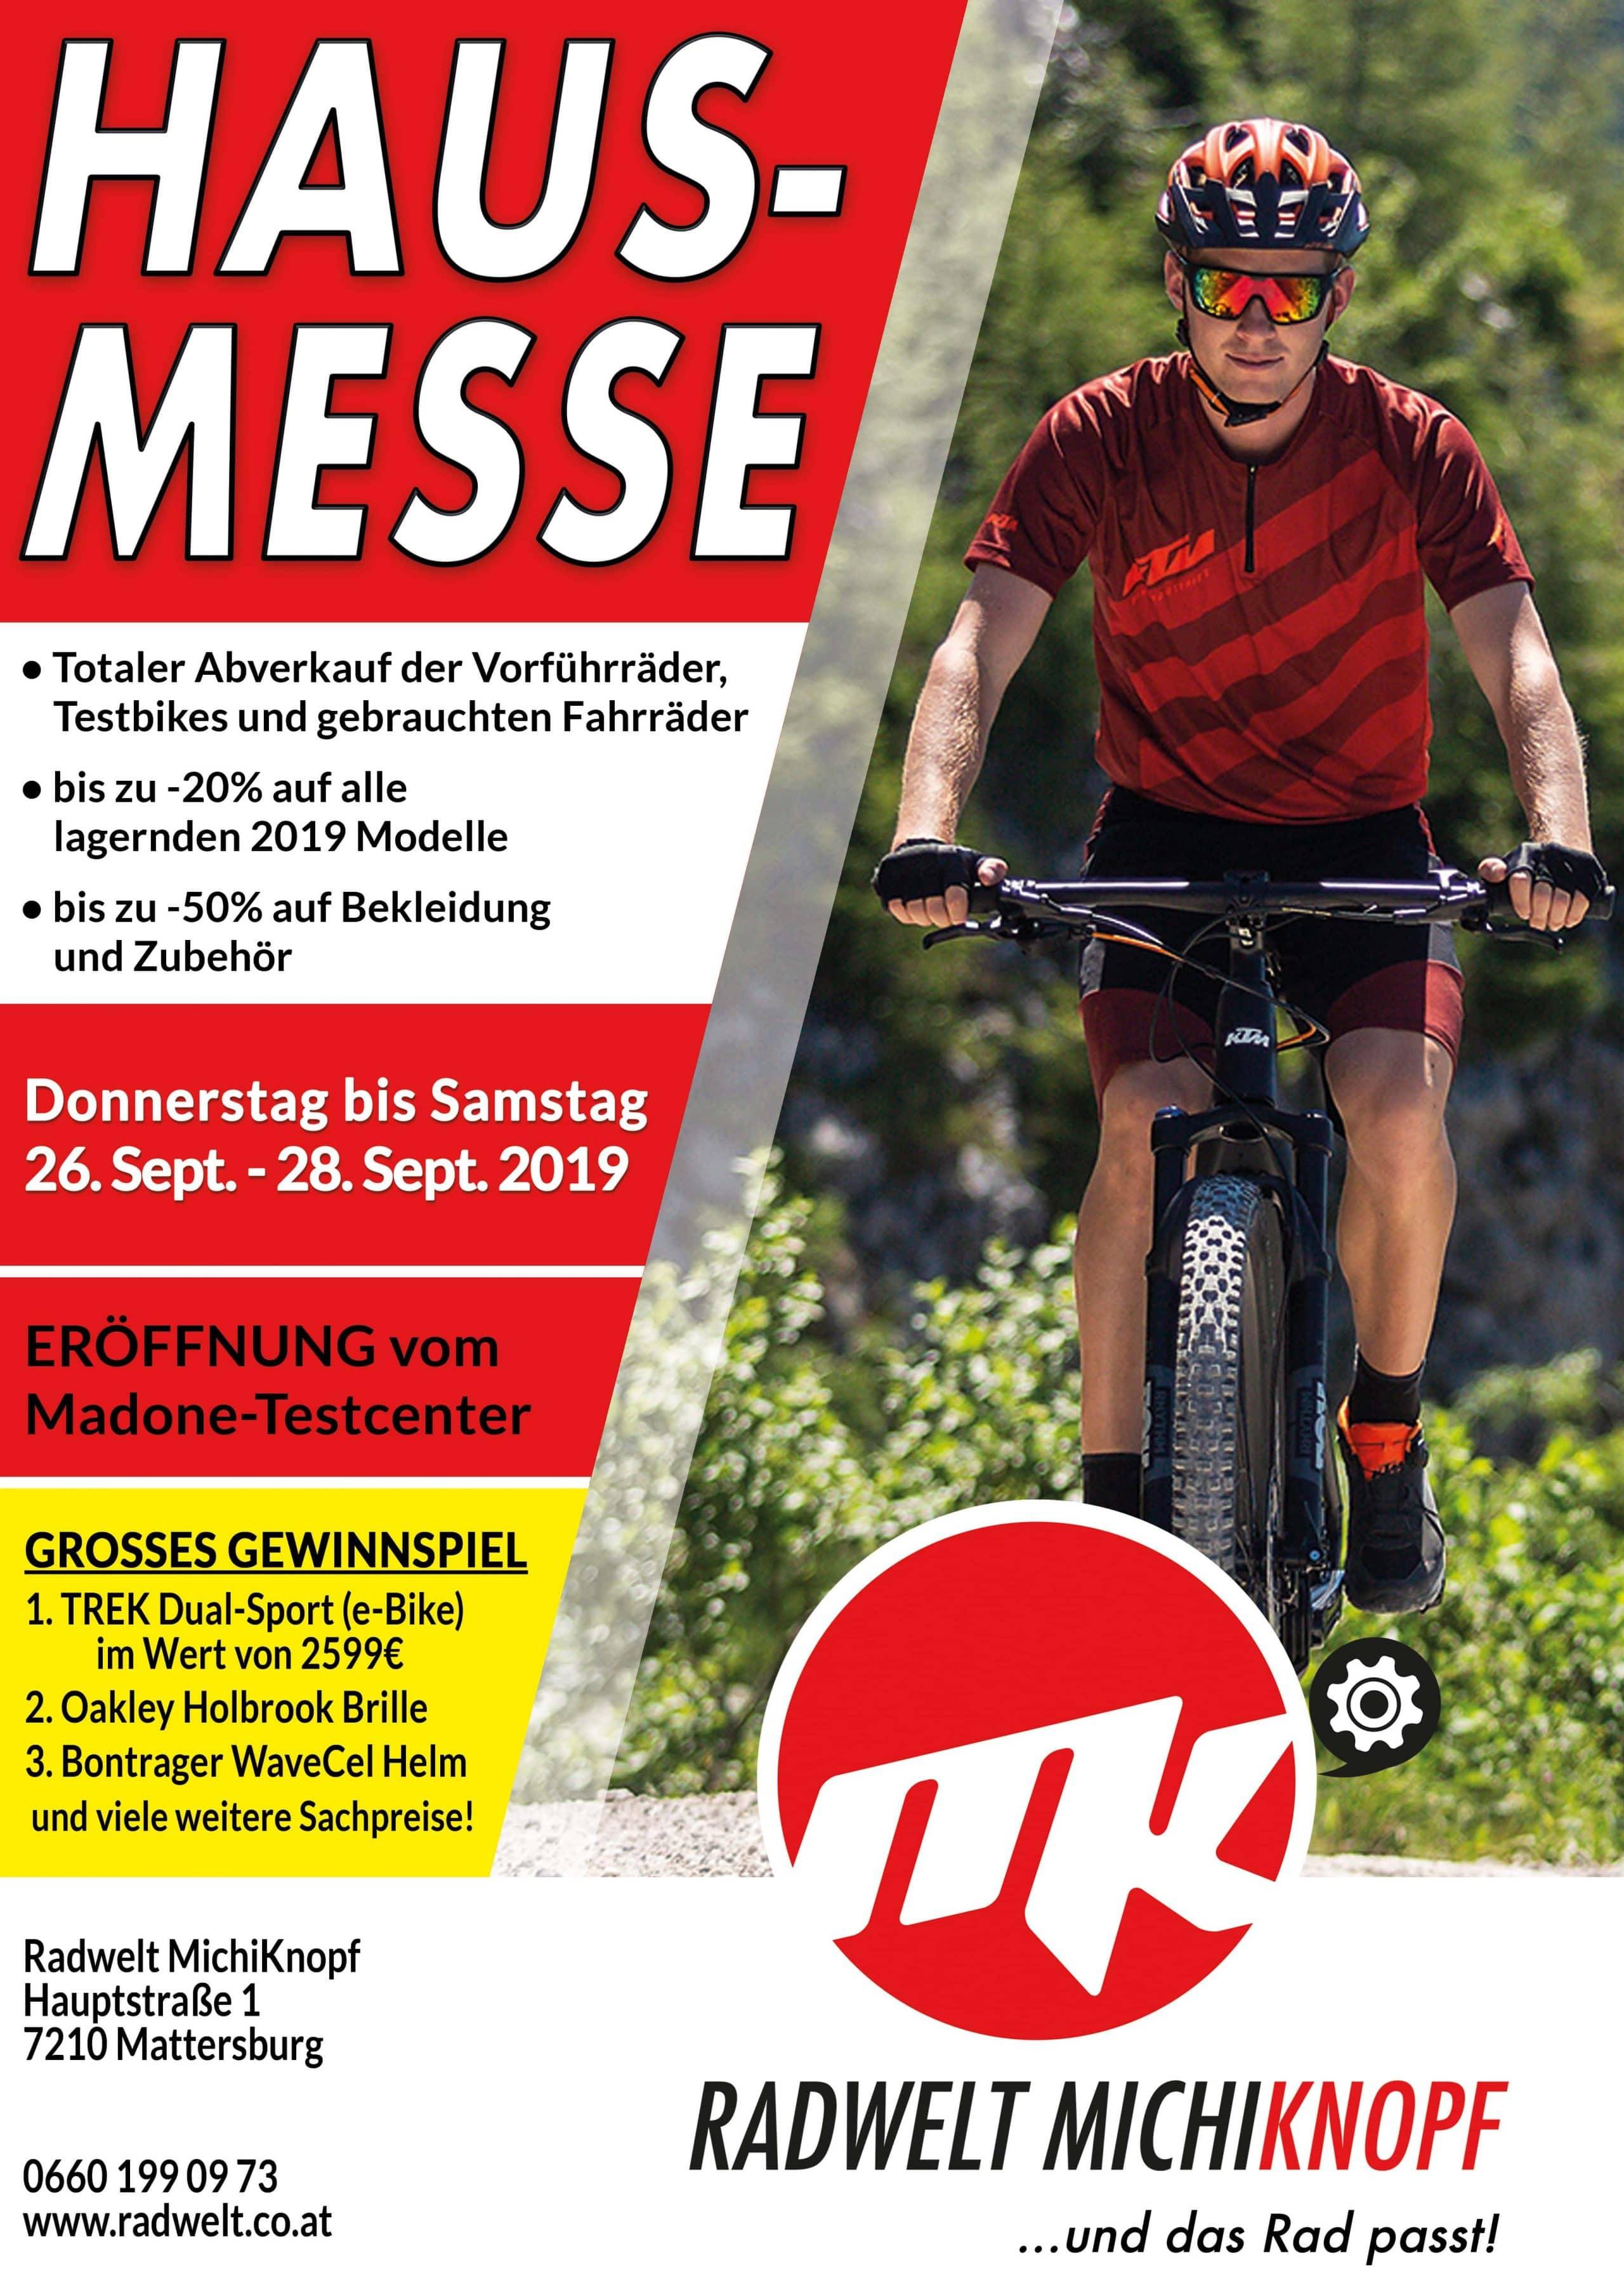 Hausmesse 2019 Radwelt MichiKnopf